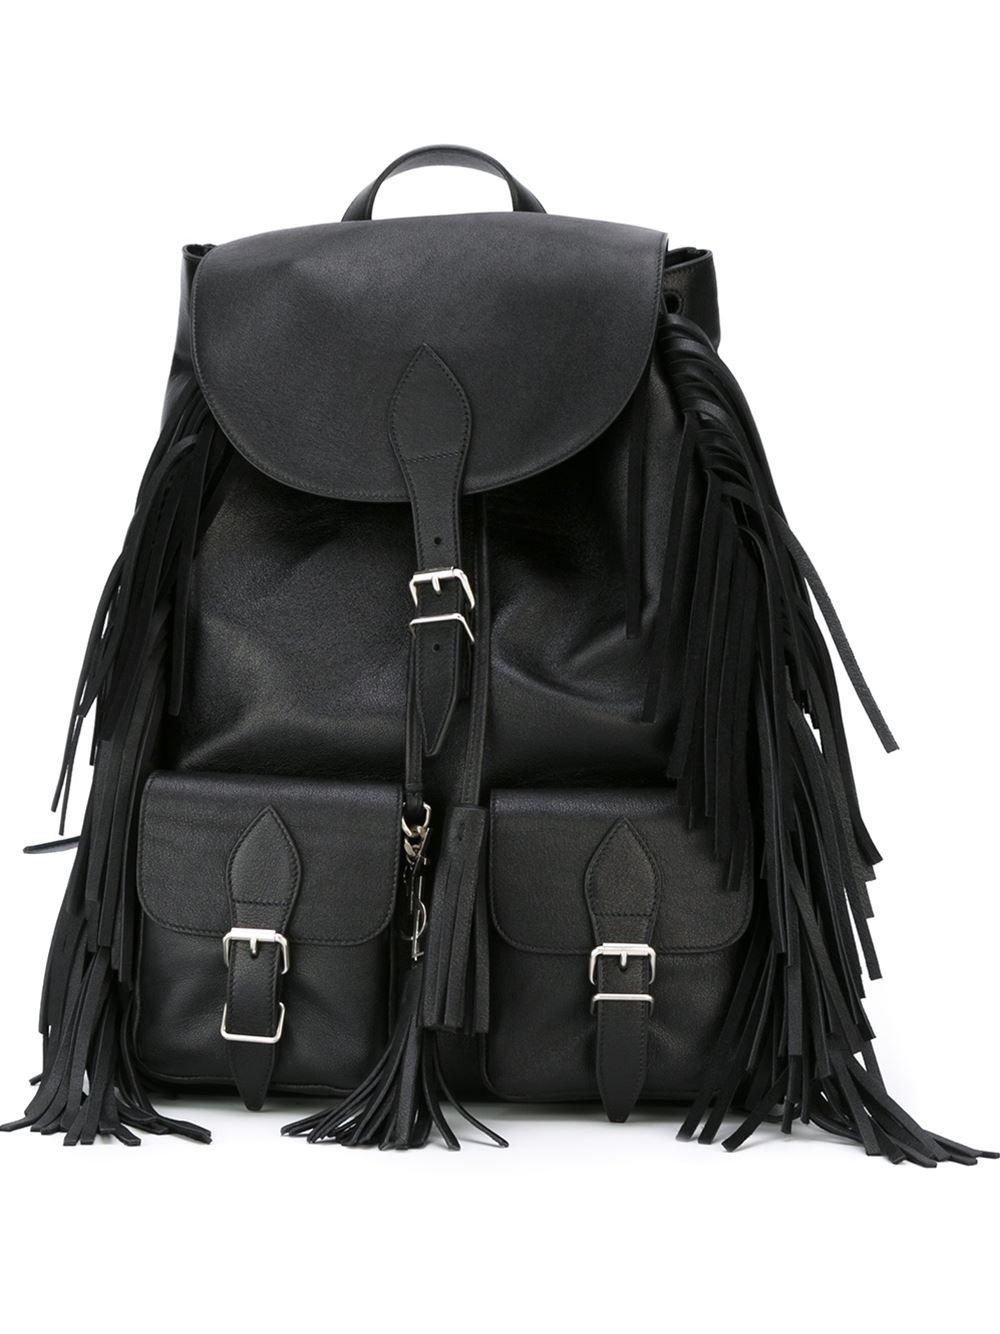 fc4b561f Saint Laurent 'Festival' backpack | SHOPAHOLIC | Festival backpack ...